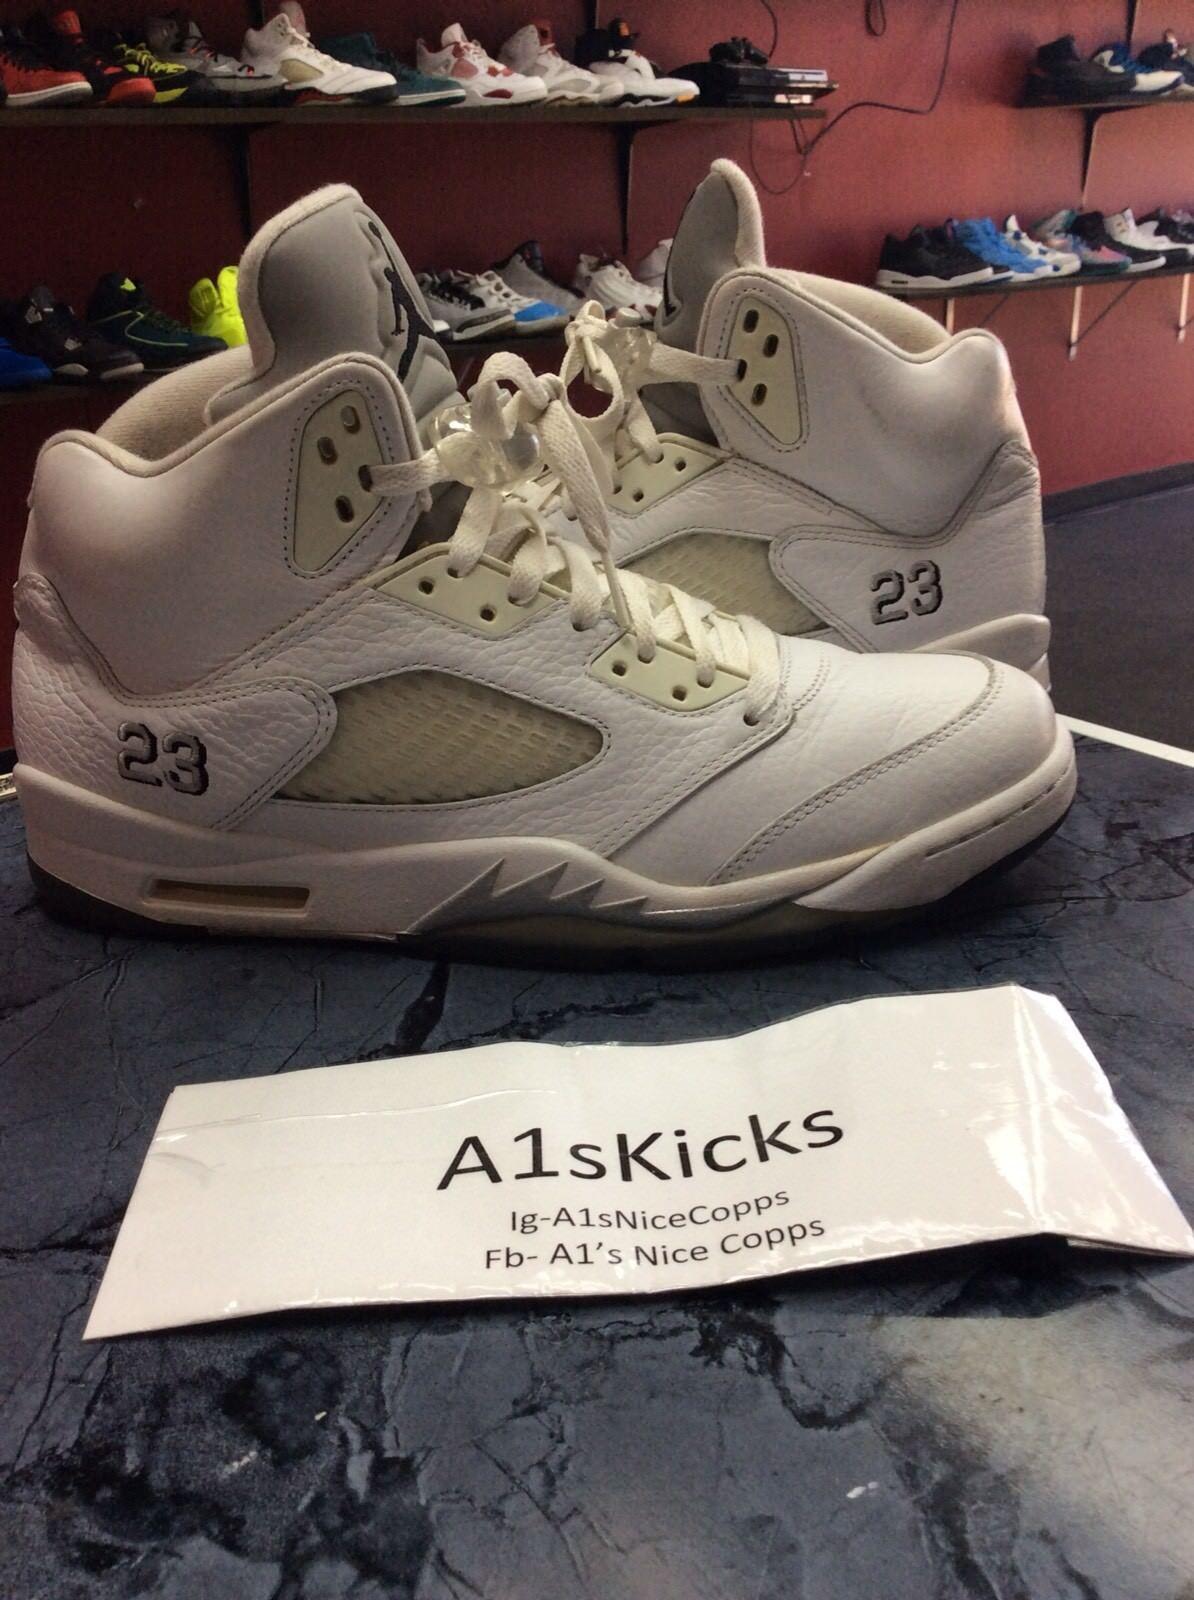 Nike Retro Air Jordan 5 White Metallic Silver 440888 130 Size 5.5